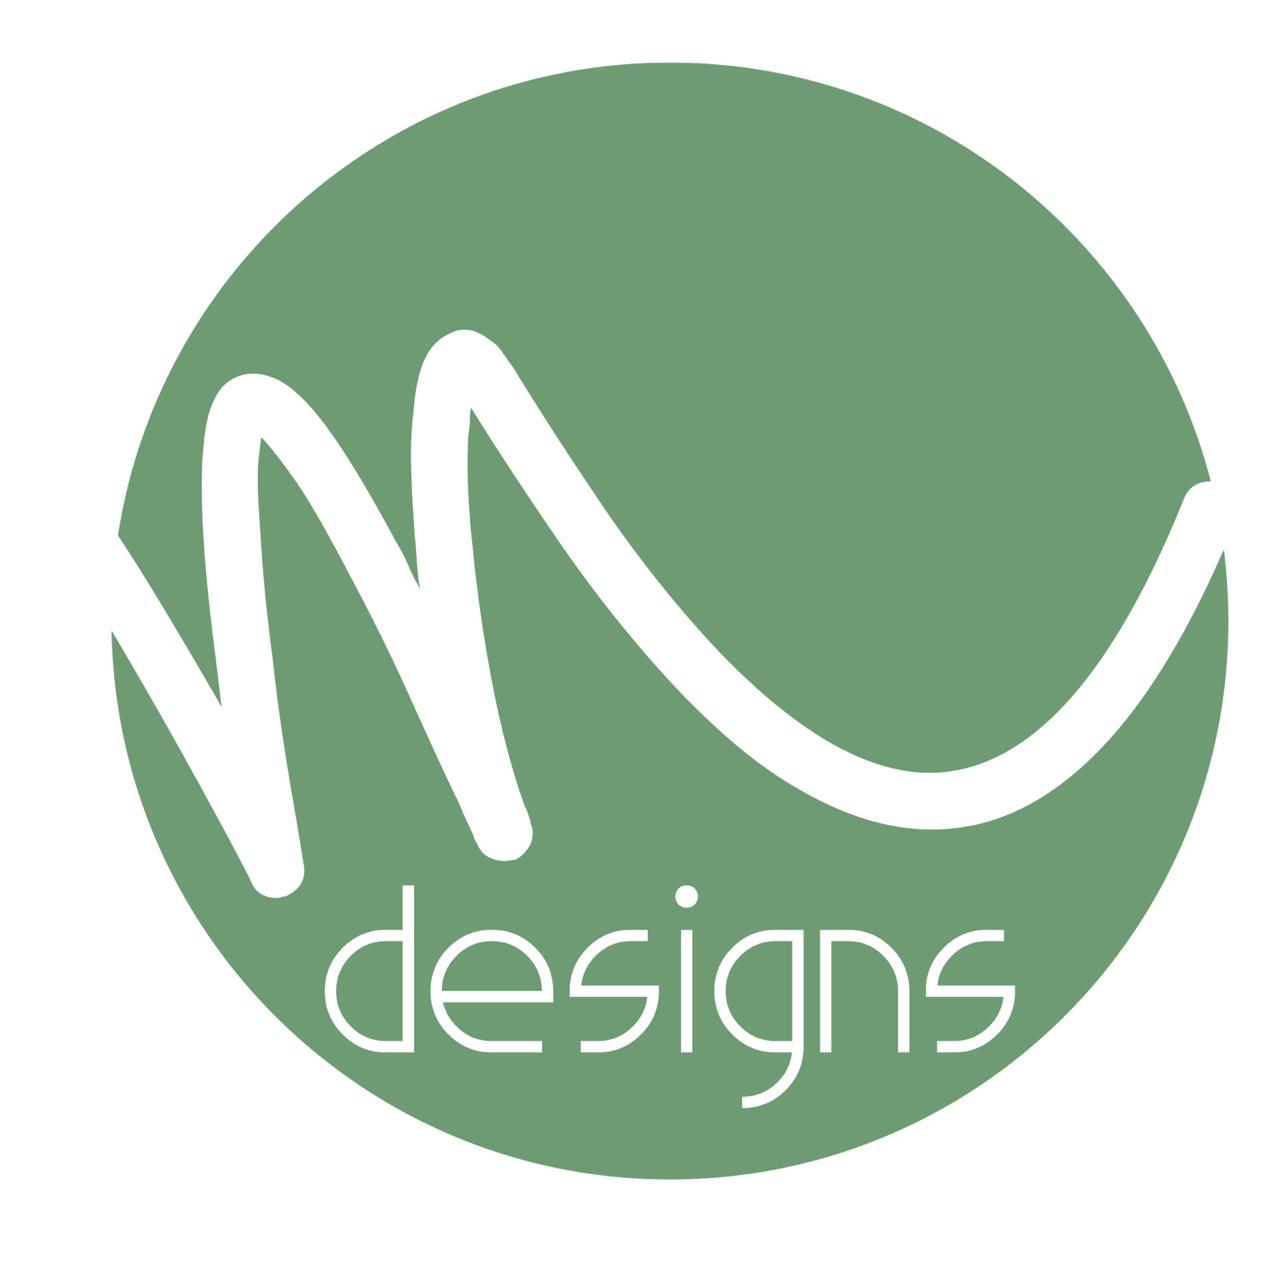 Millicent Designs